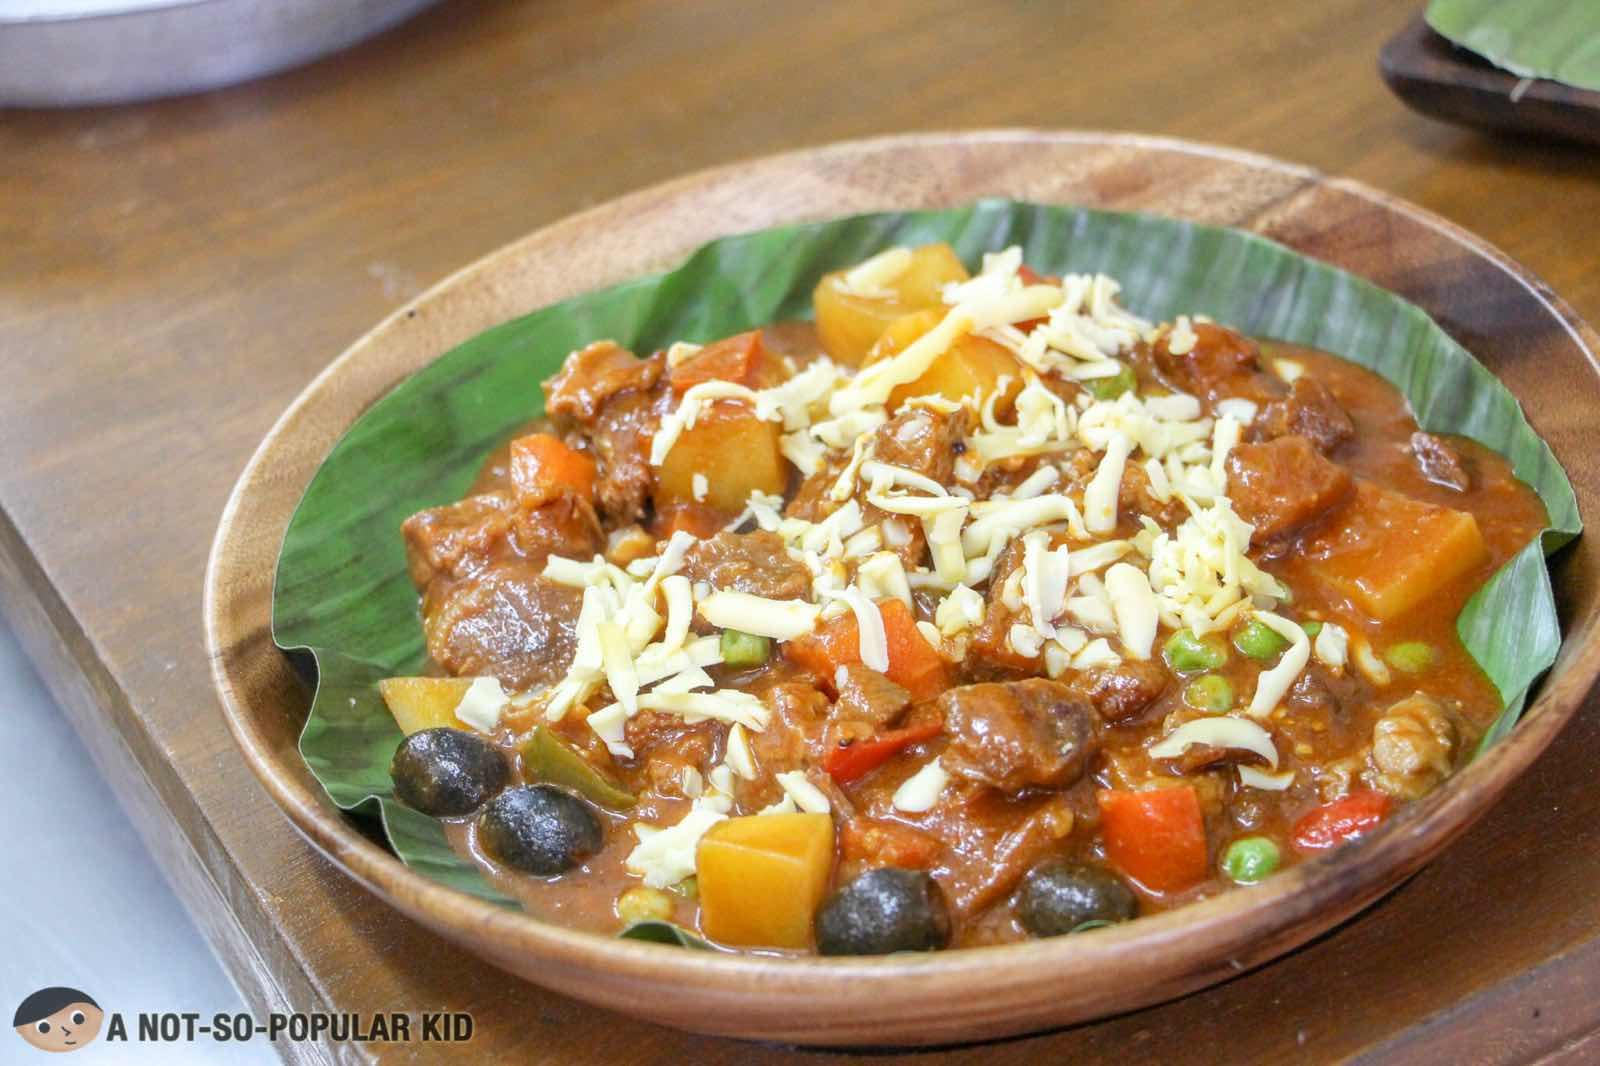 Pinoy Kaldereta - beef stew in tomato sauce